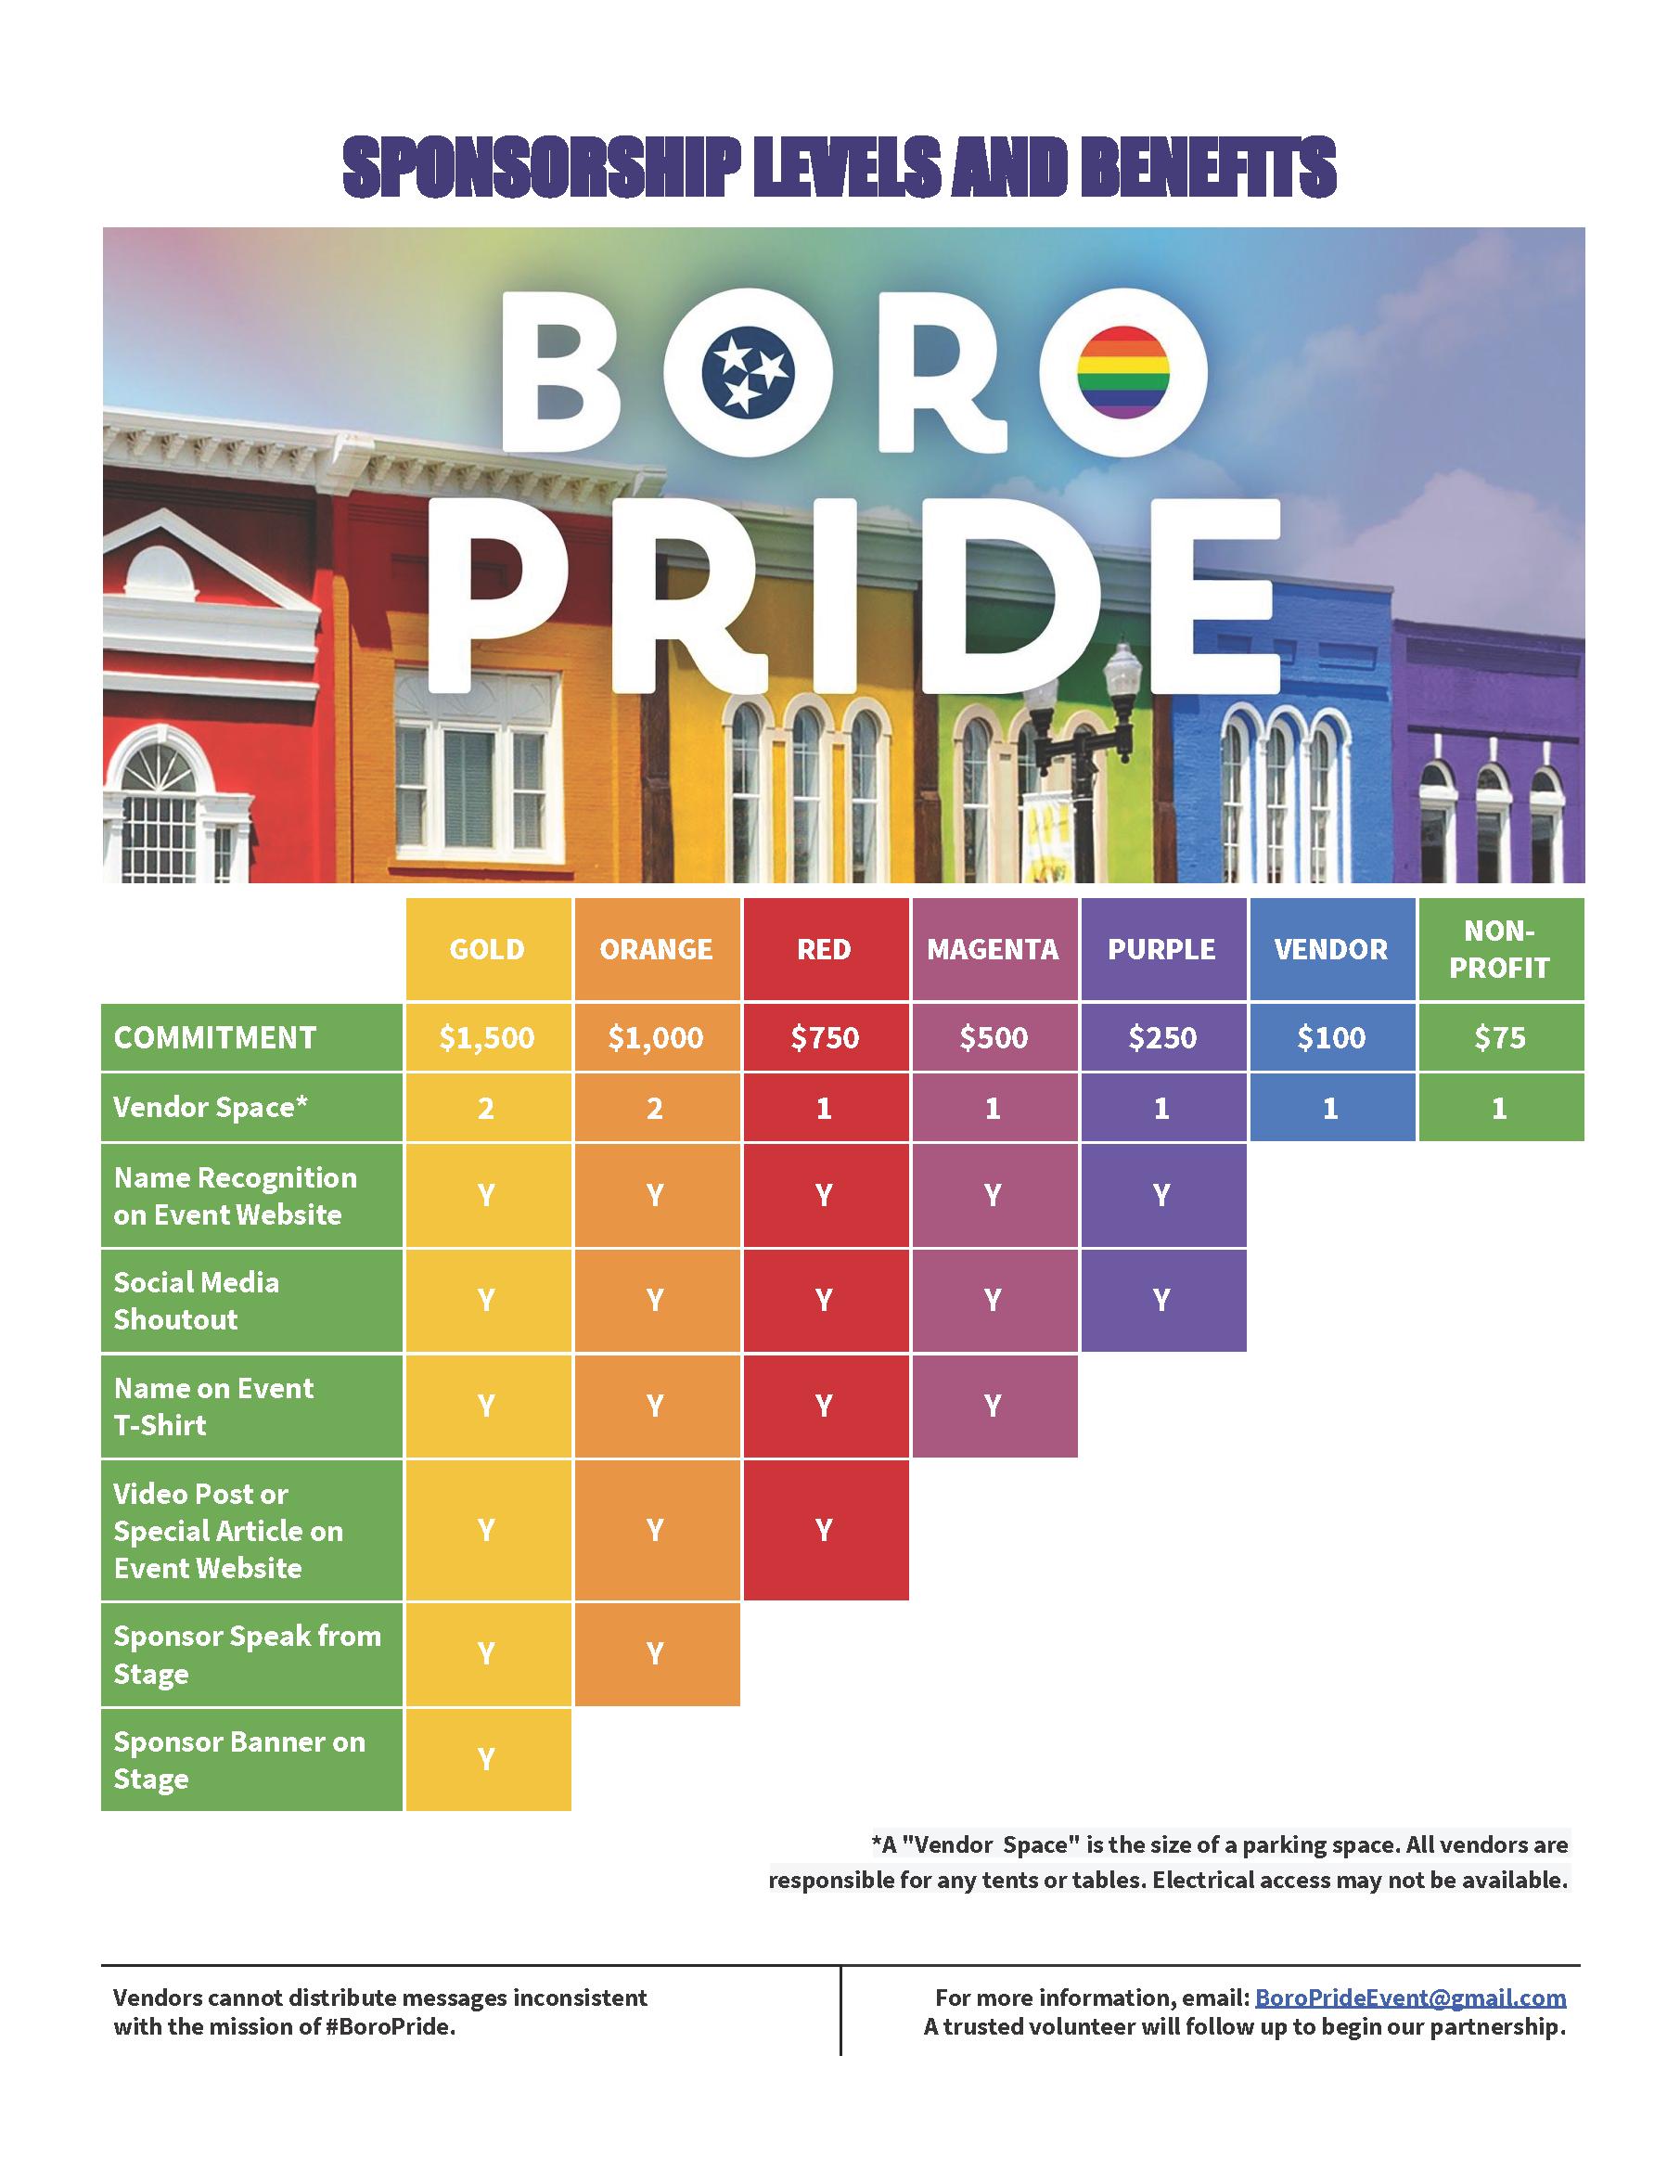 2019_Boro_Pride_Sponsorhip_Levels_-_03.21.19.png